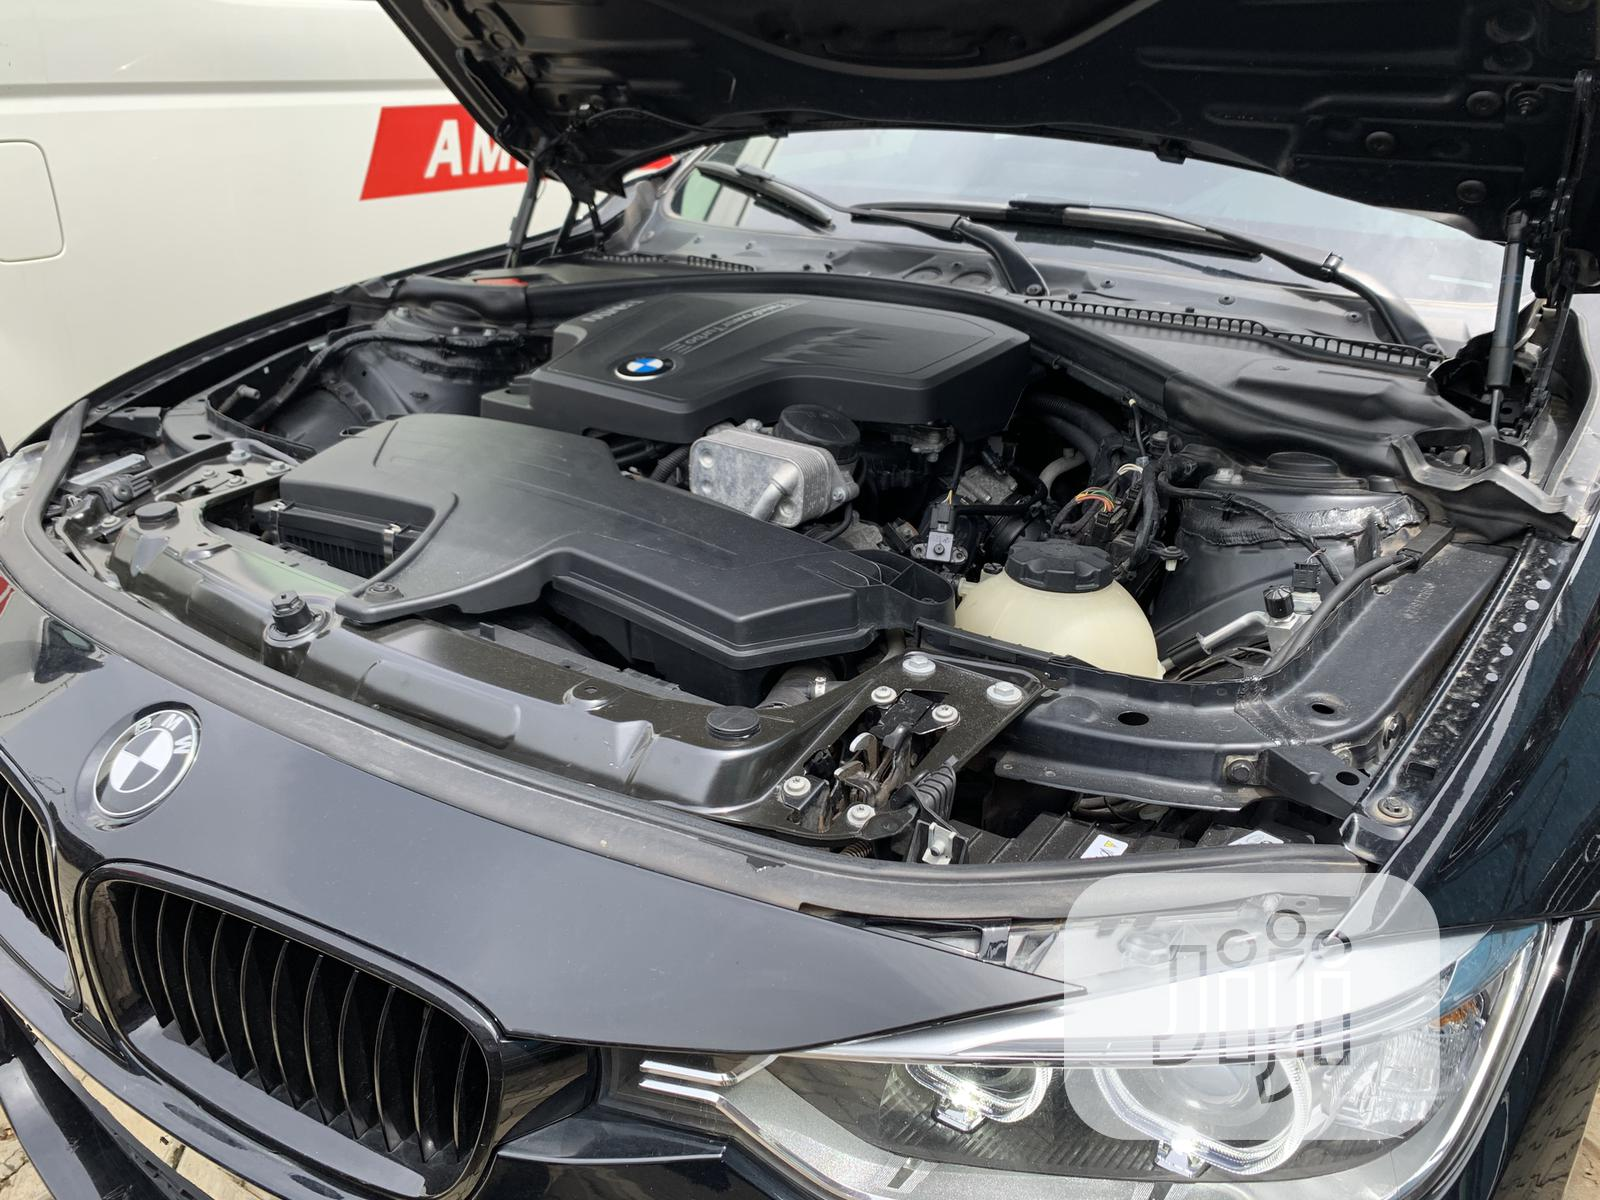 Archive: BMW 328i 2013 Black